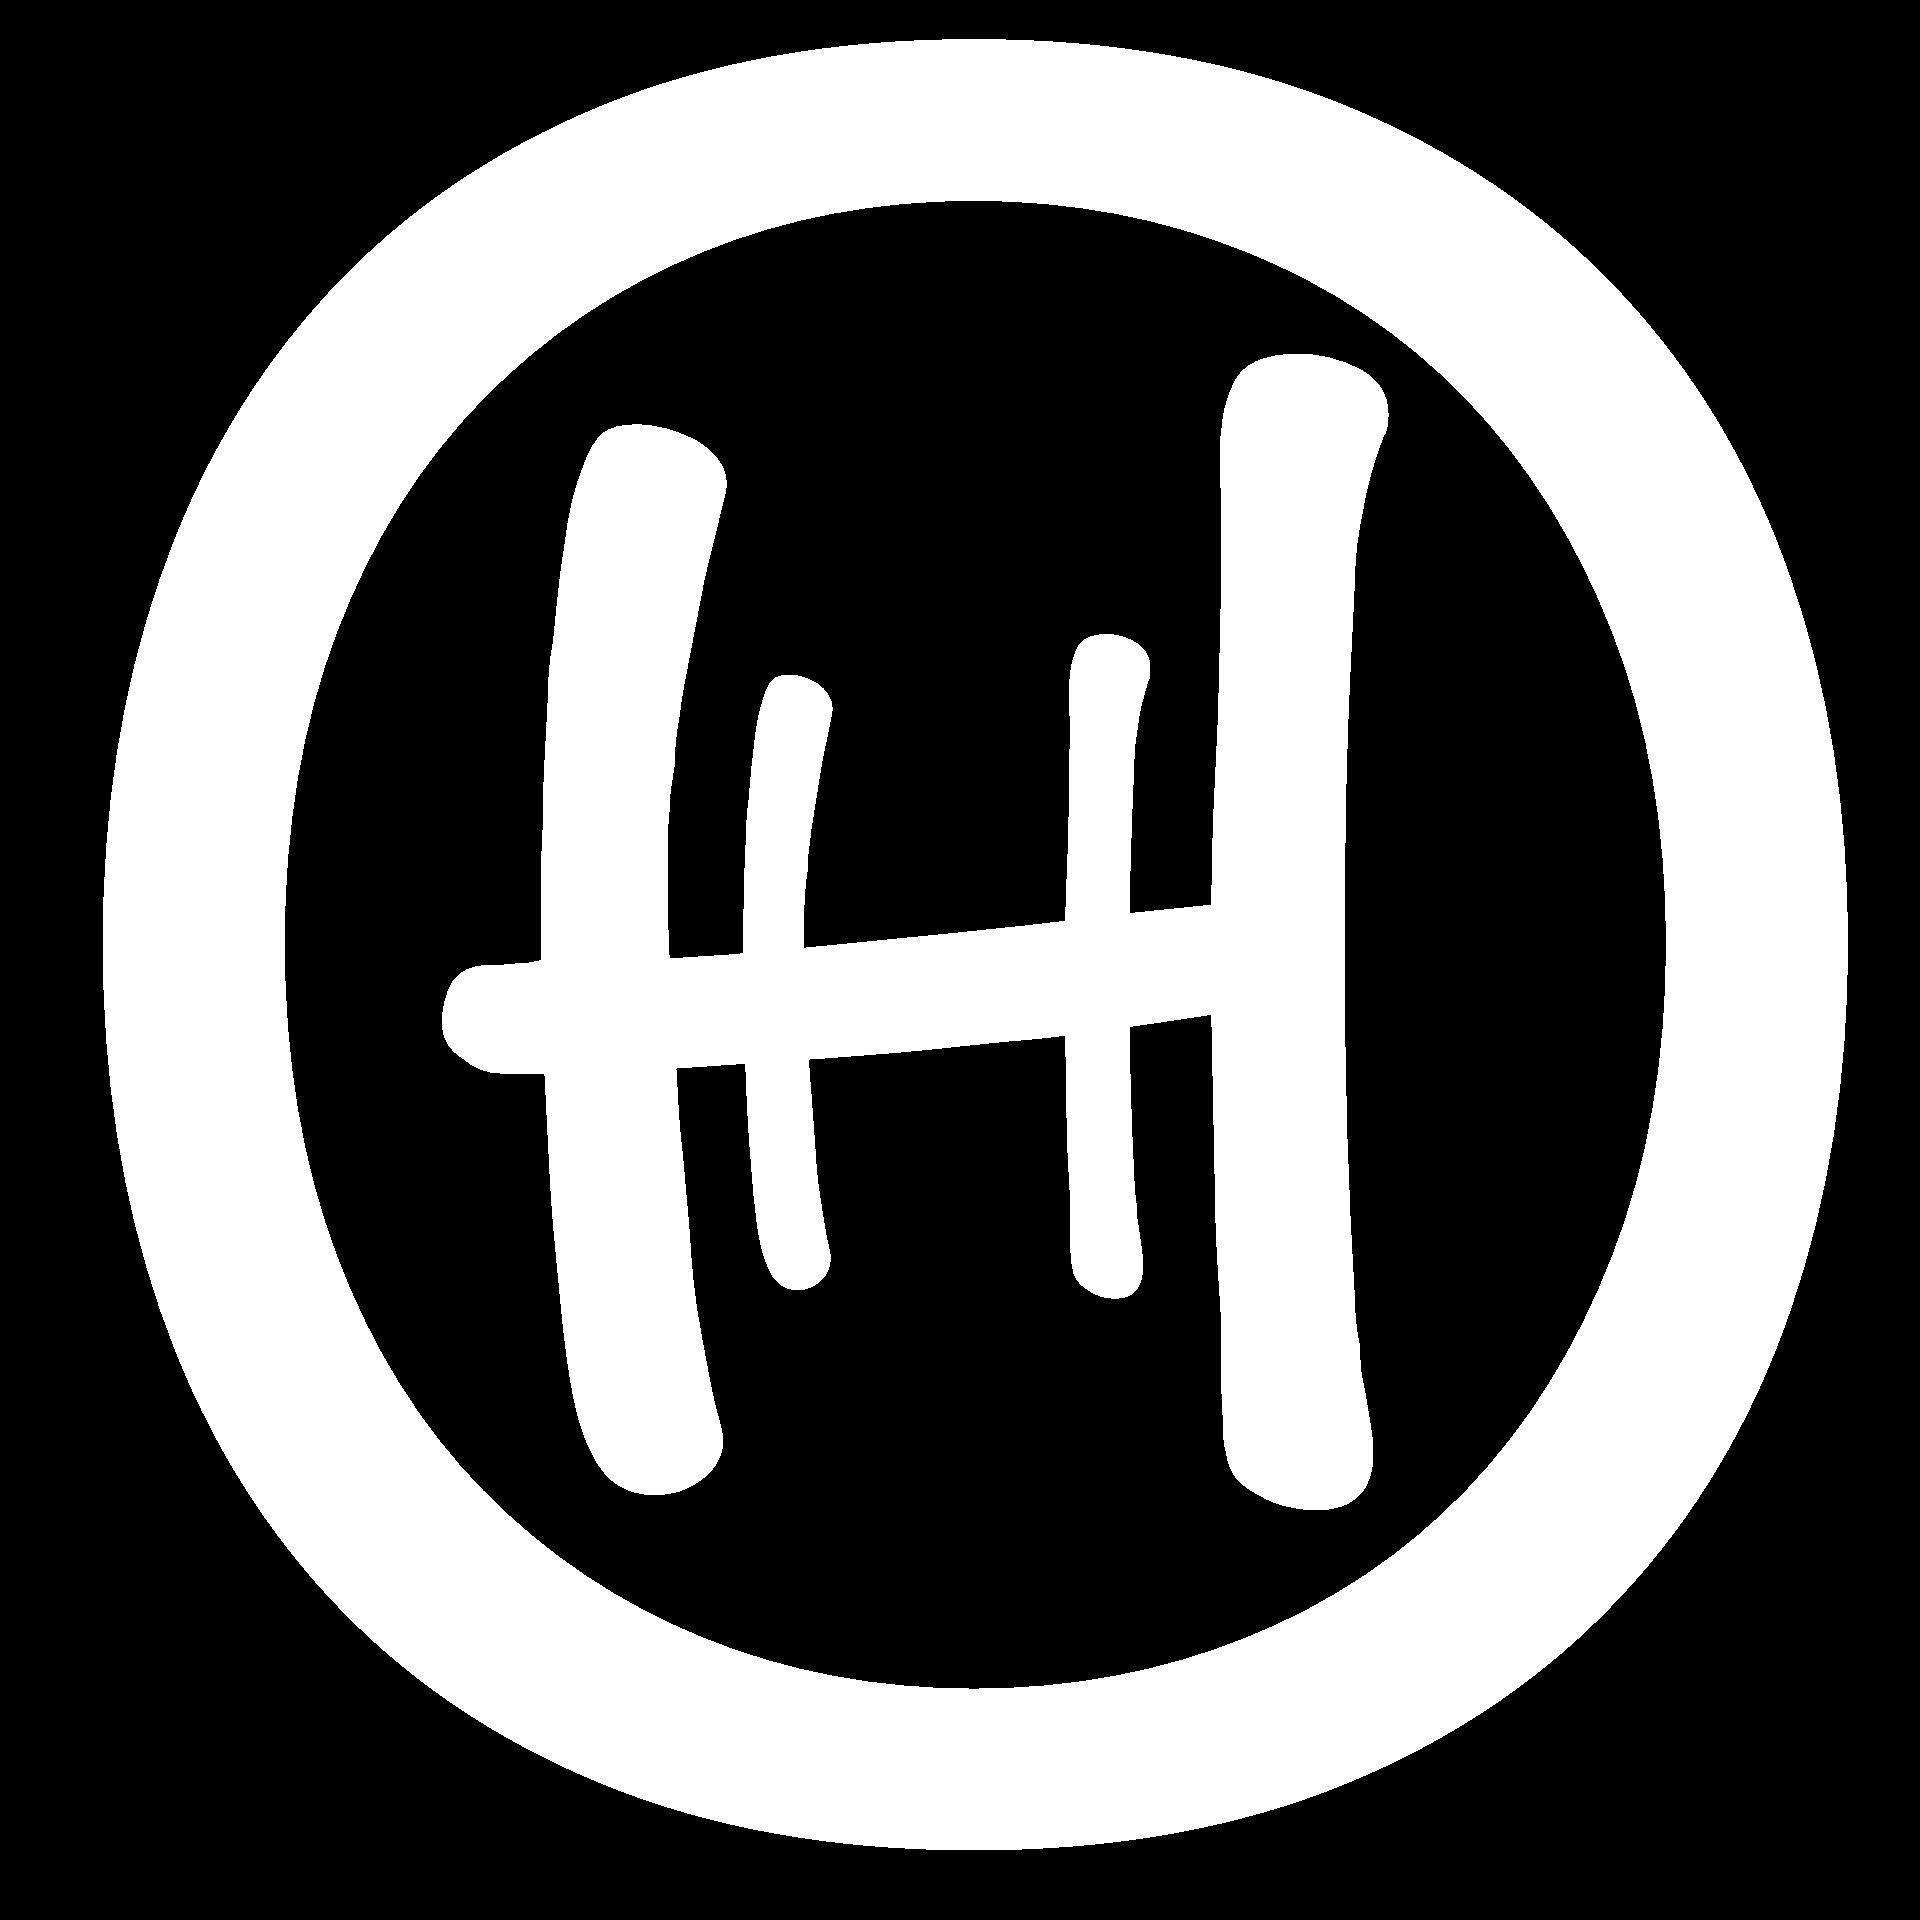 Ole Højer Hansen